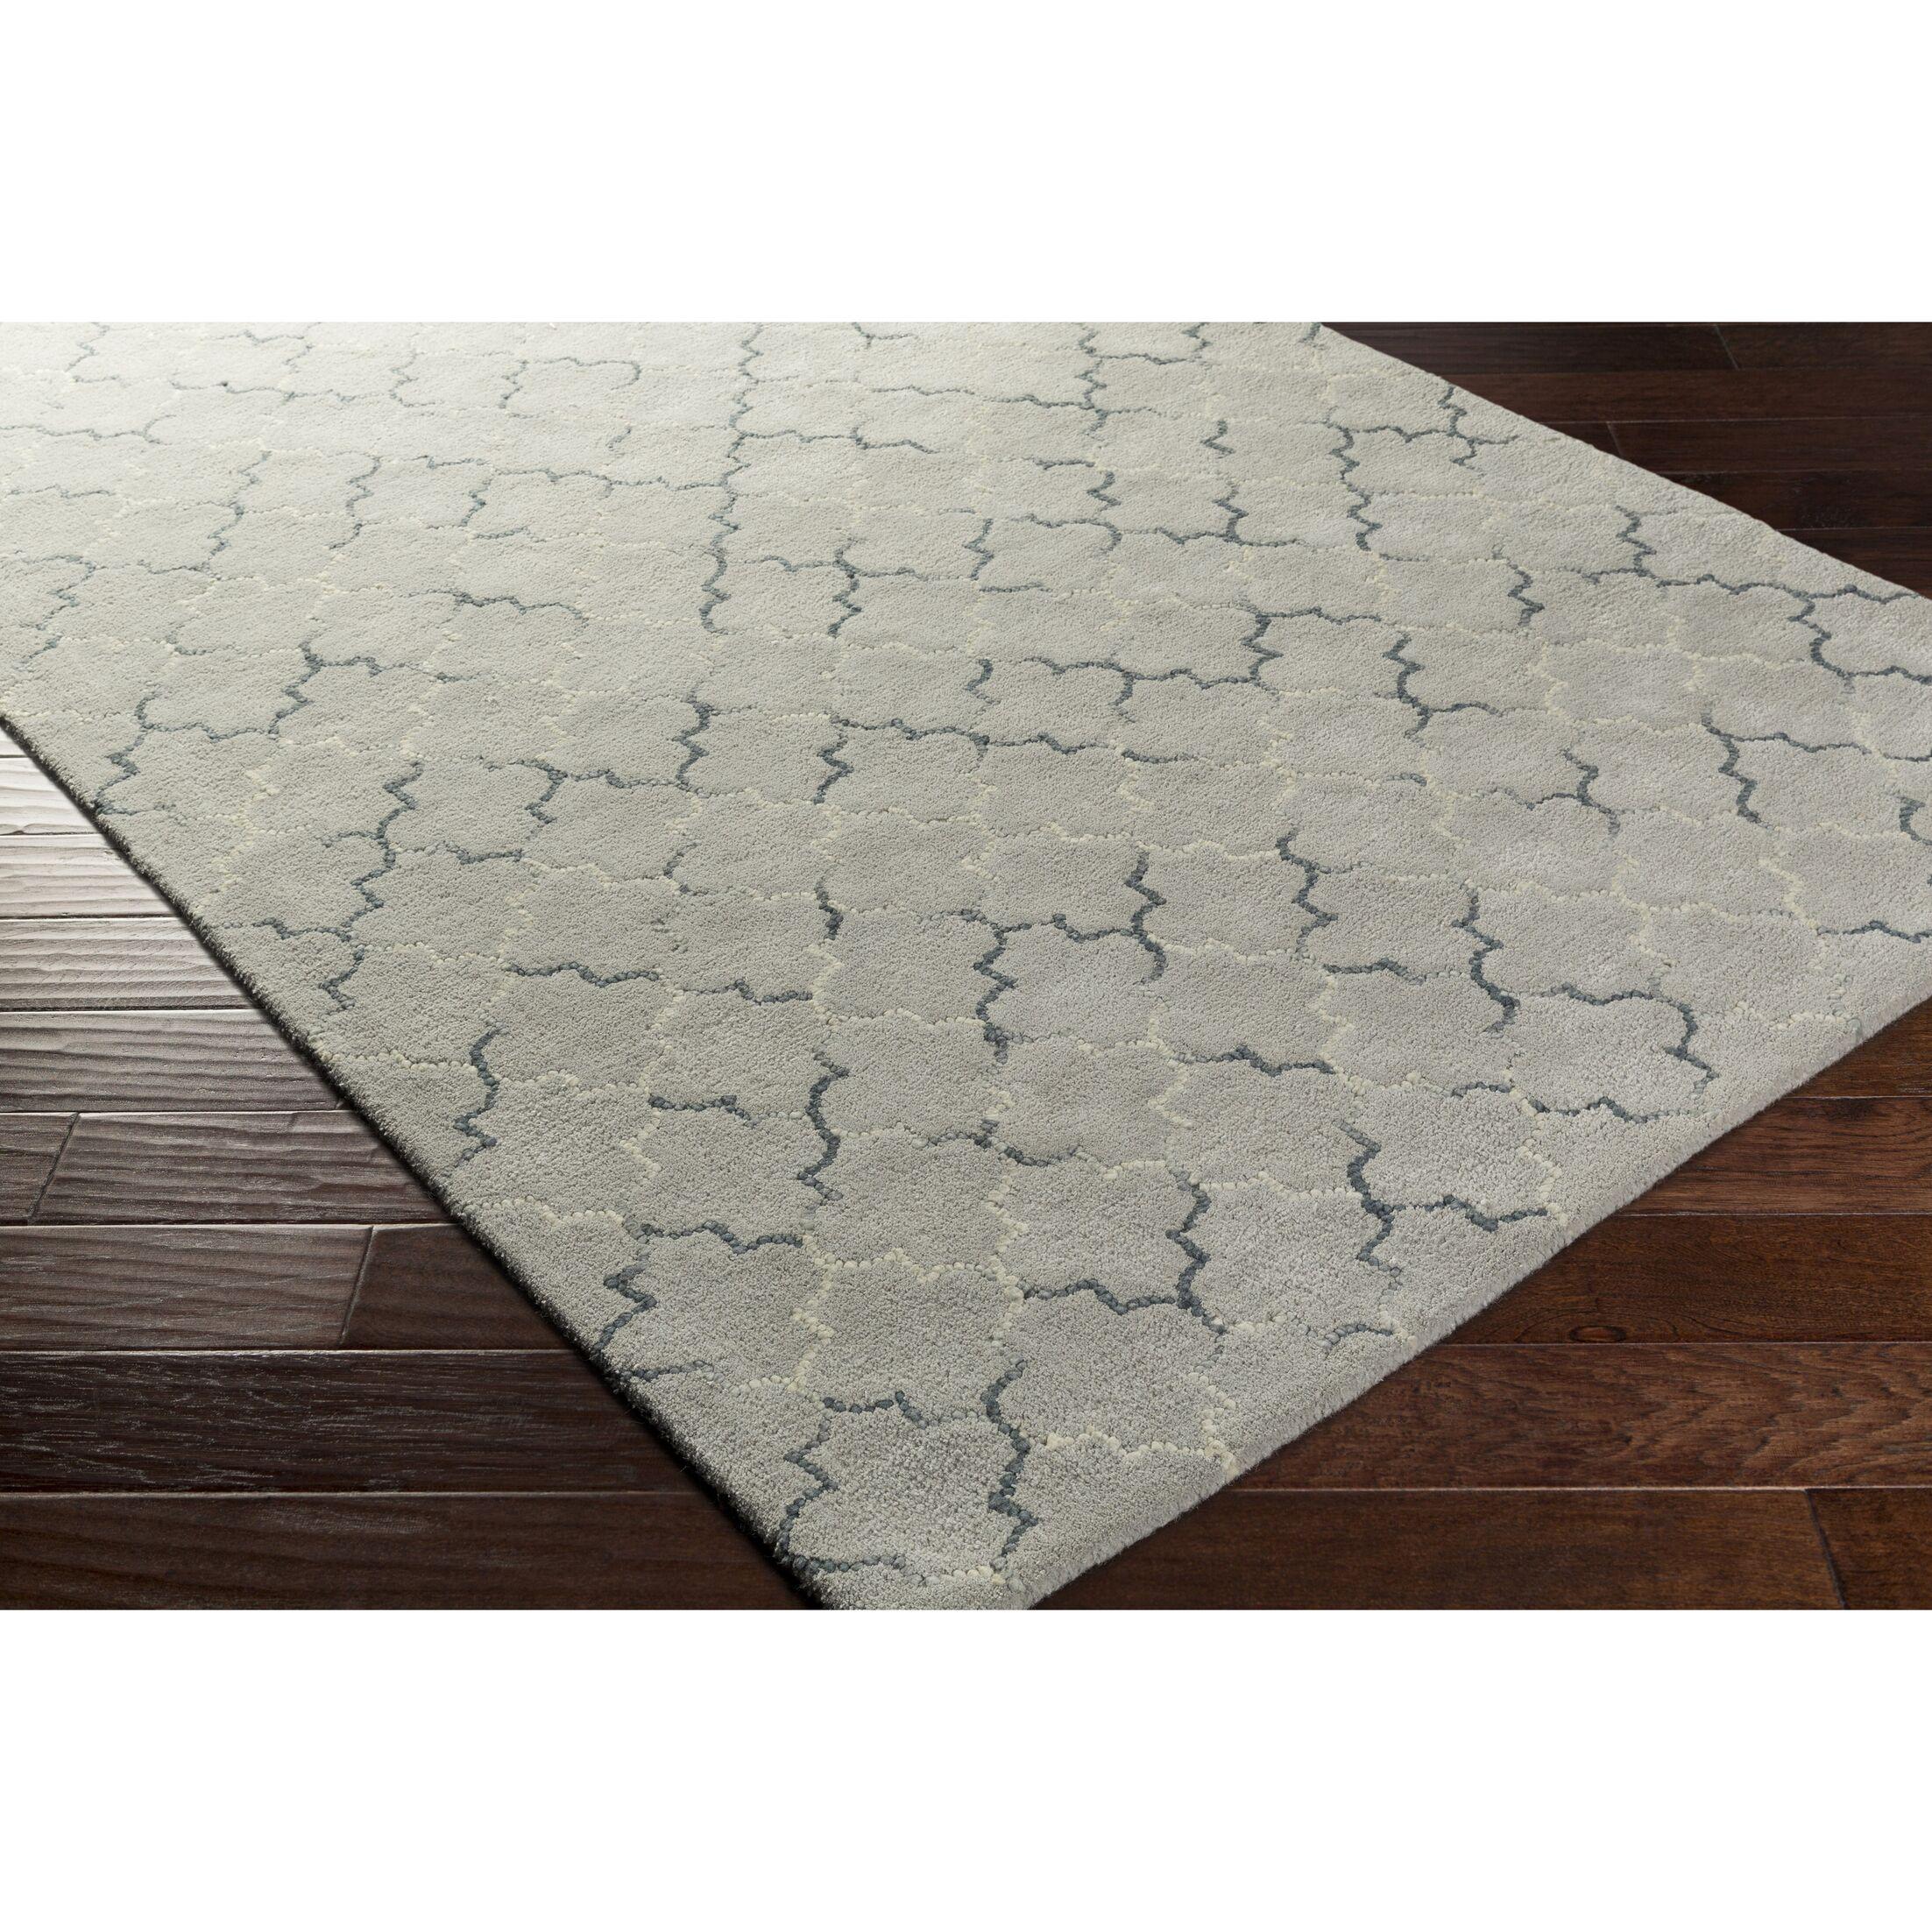 Hopkinton Hand-Tufted Gray/Neutral Area Rug Rug Size: Rectangle 8' x 10'